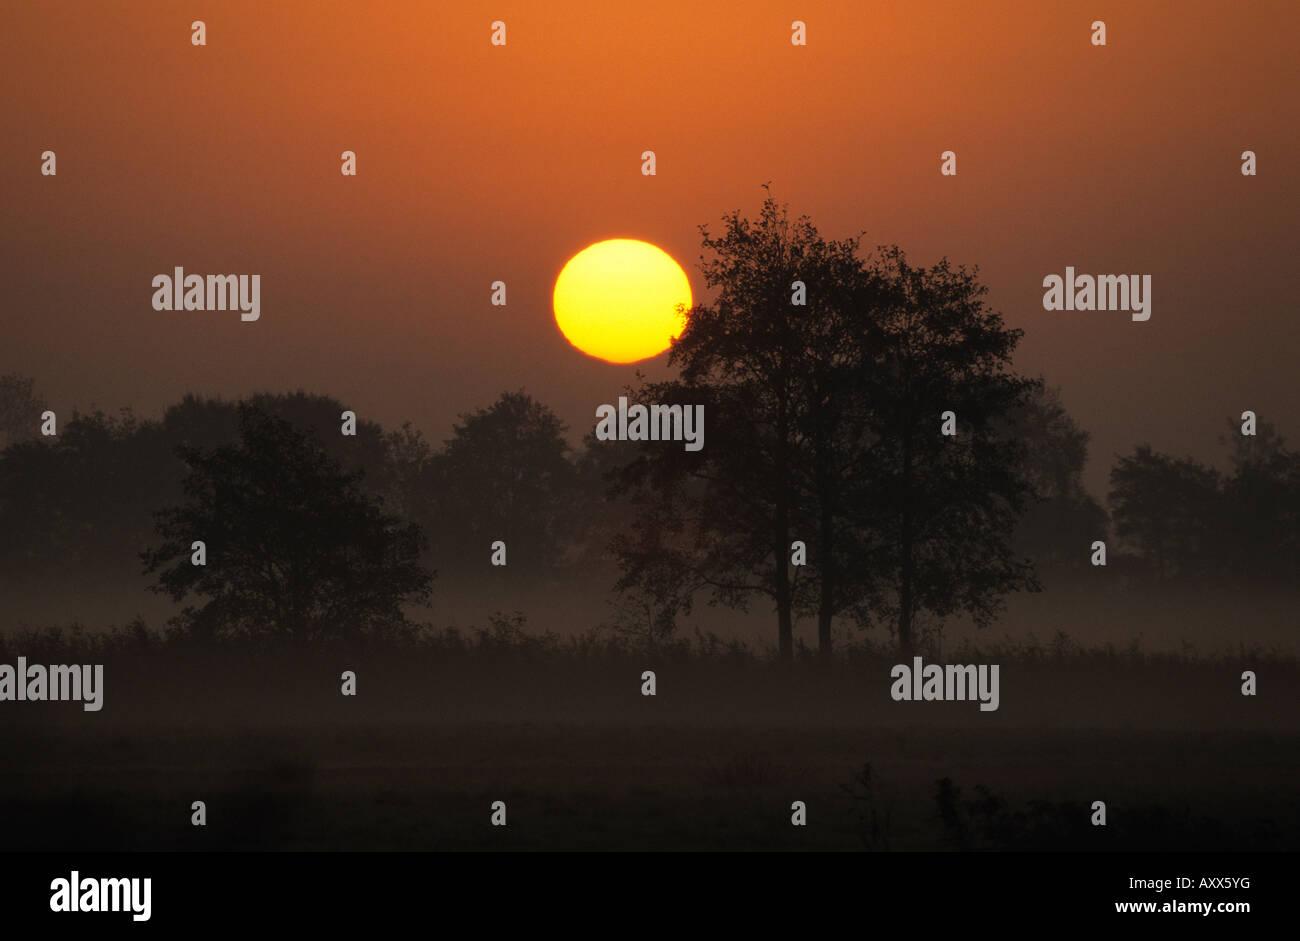 Sunrise, Fischland, Mecklenburg-Vorpommern, Germany - Stock Image